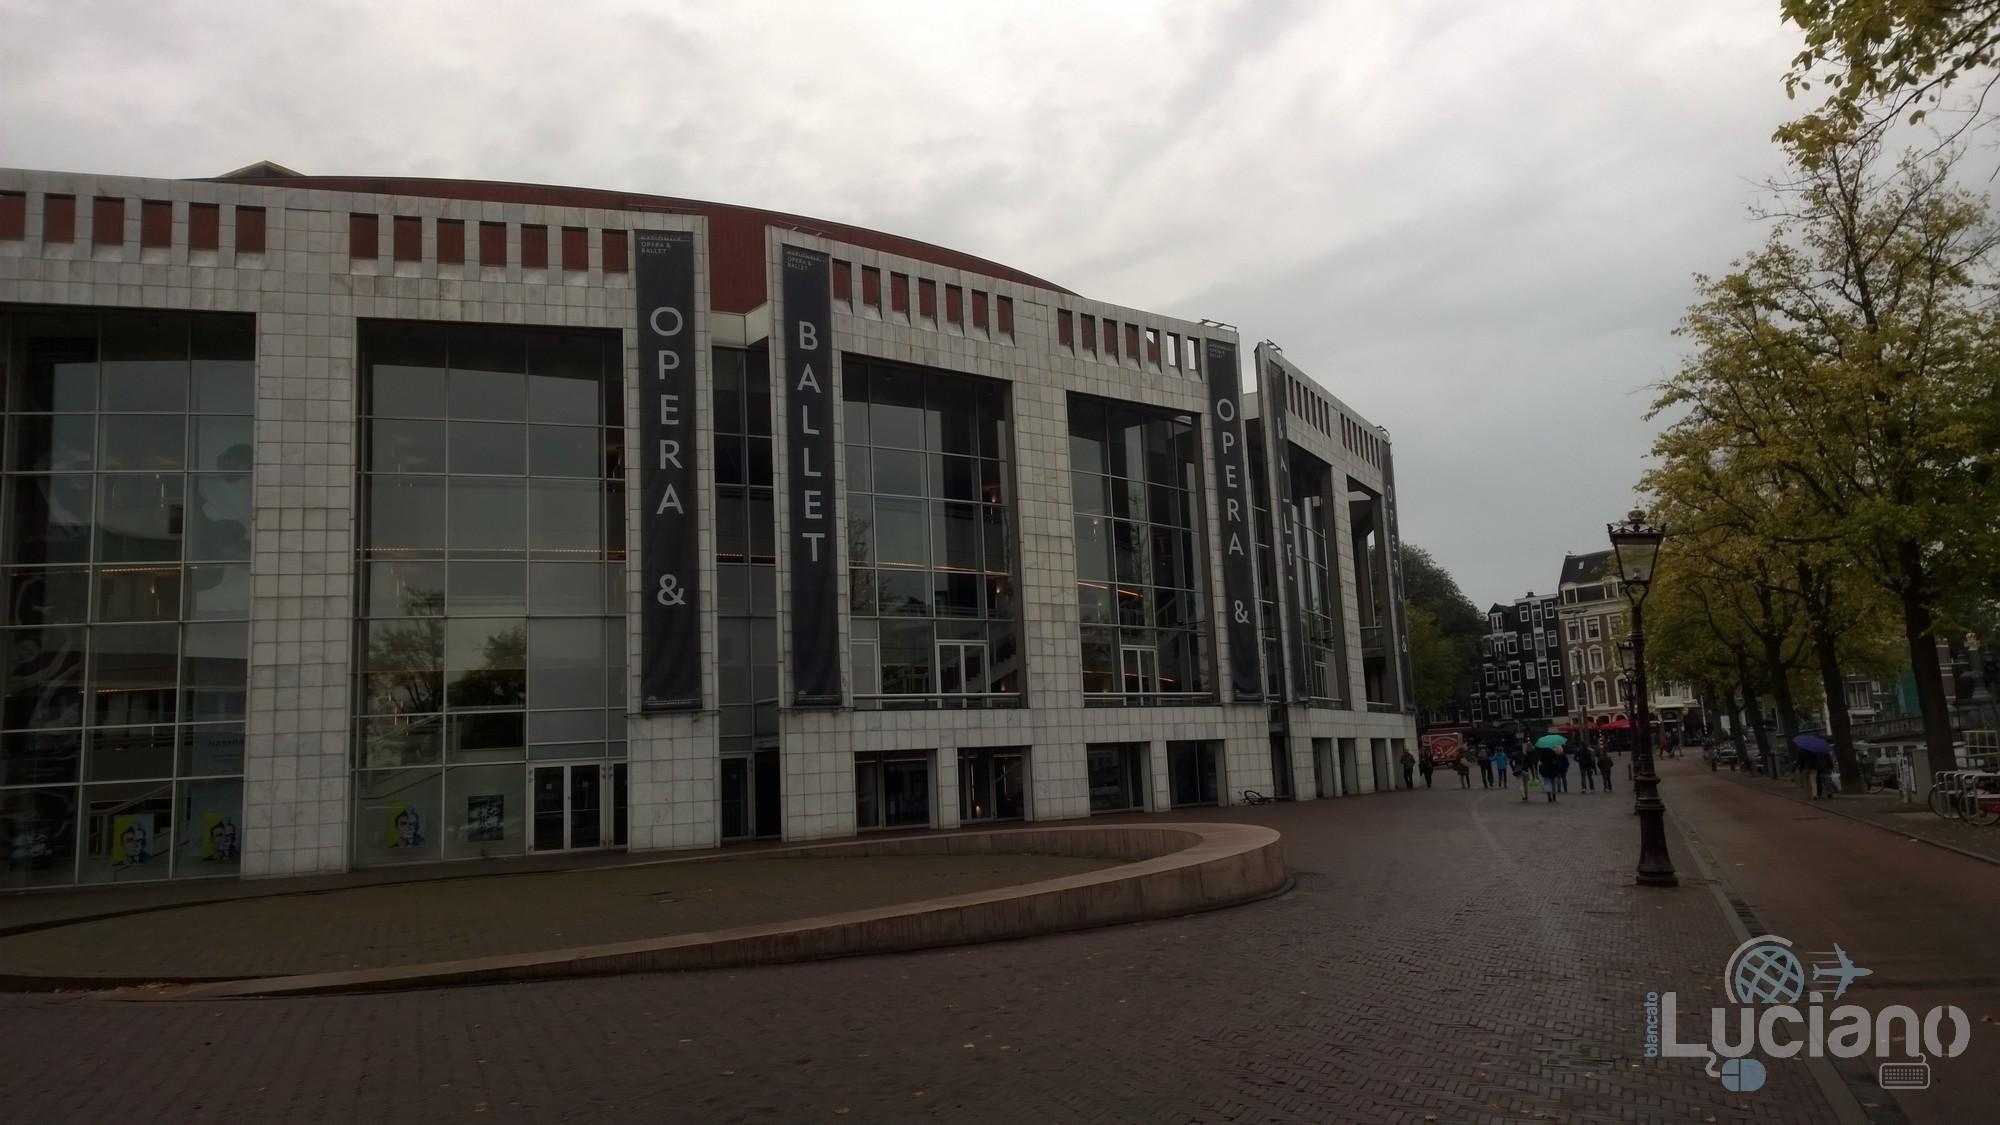 amsterdam-2014-vueling-lucianoblancatoit (179)